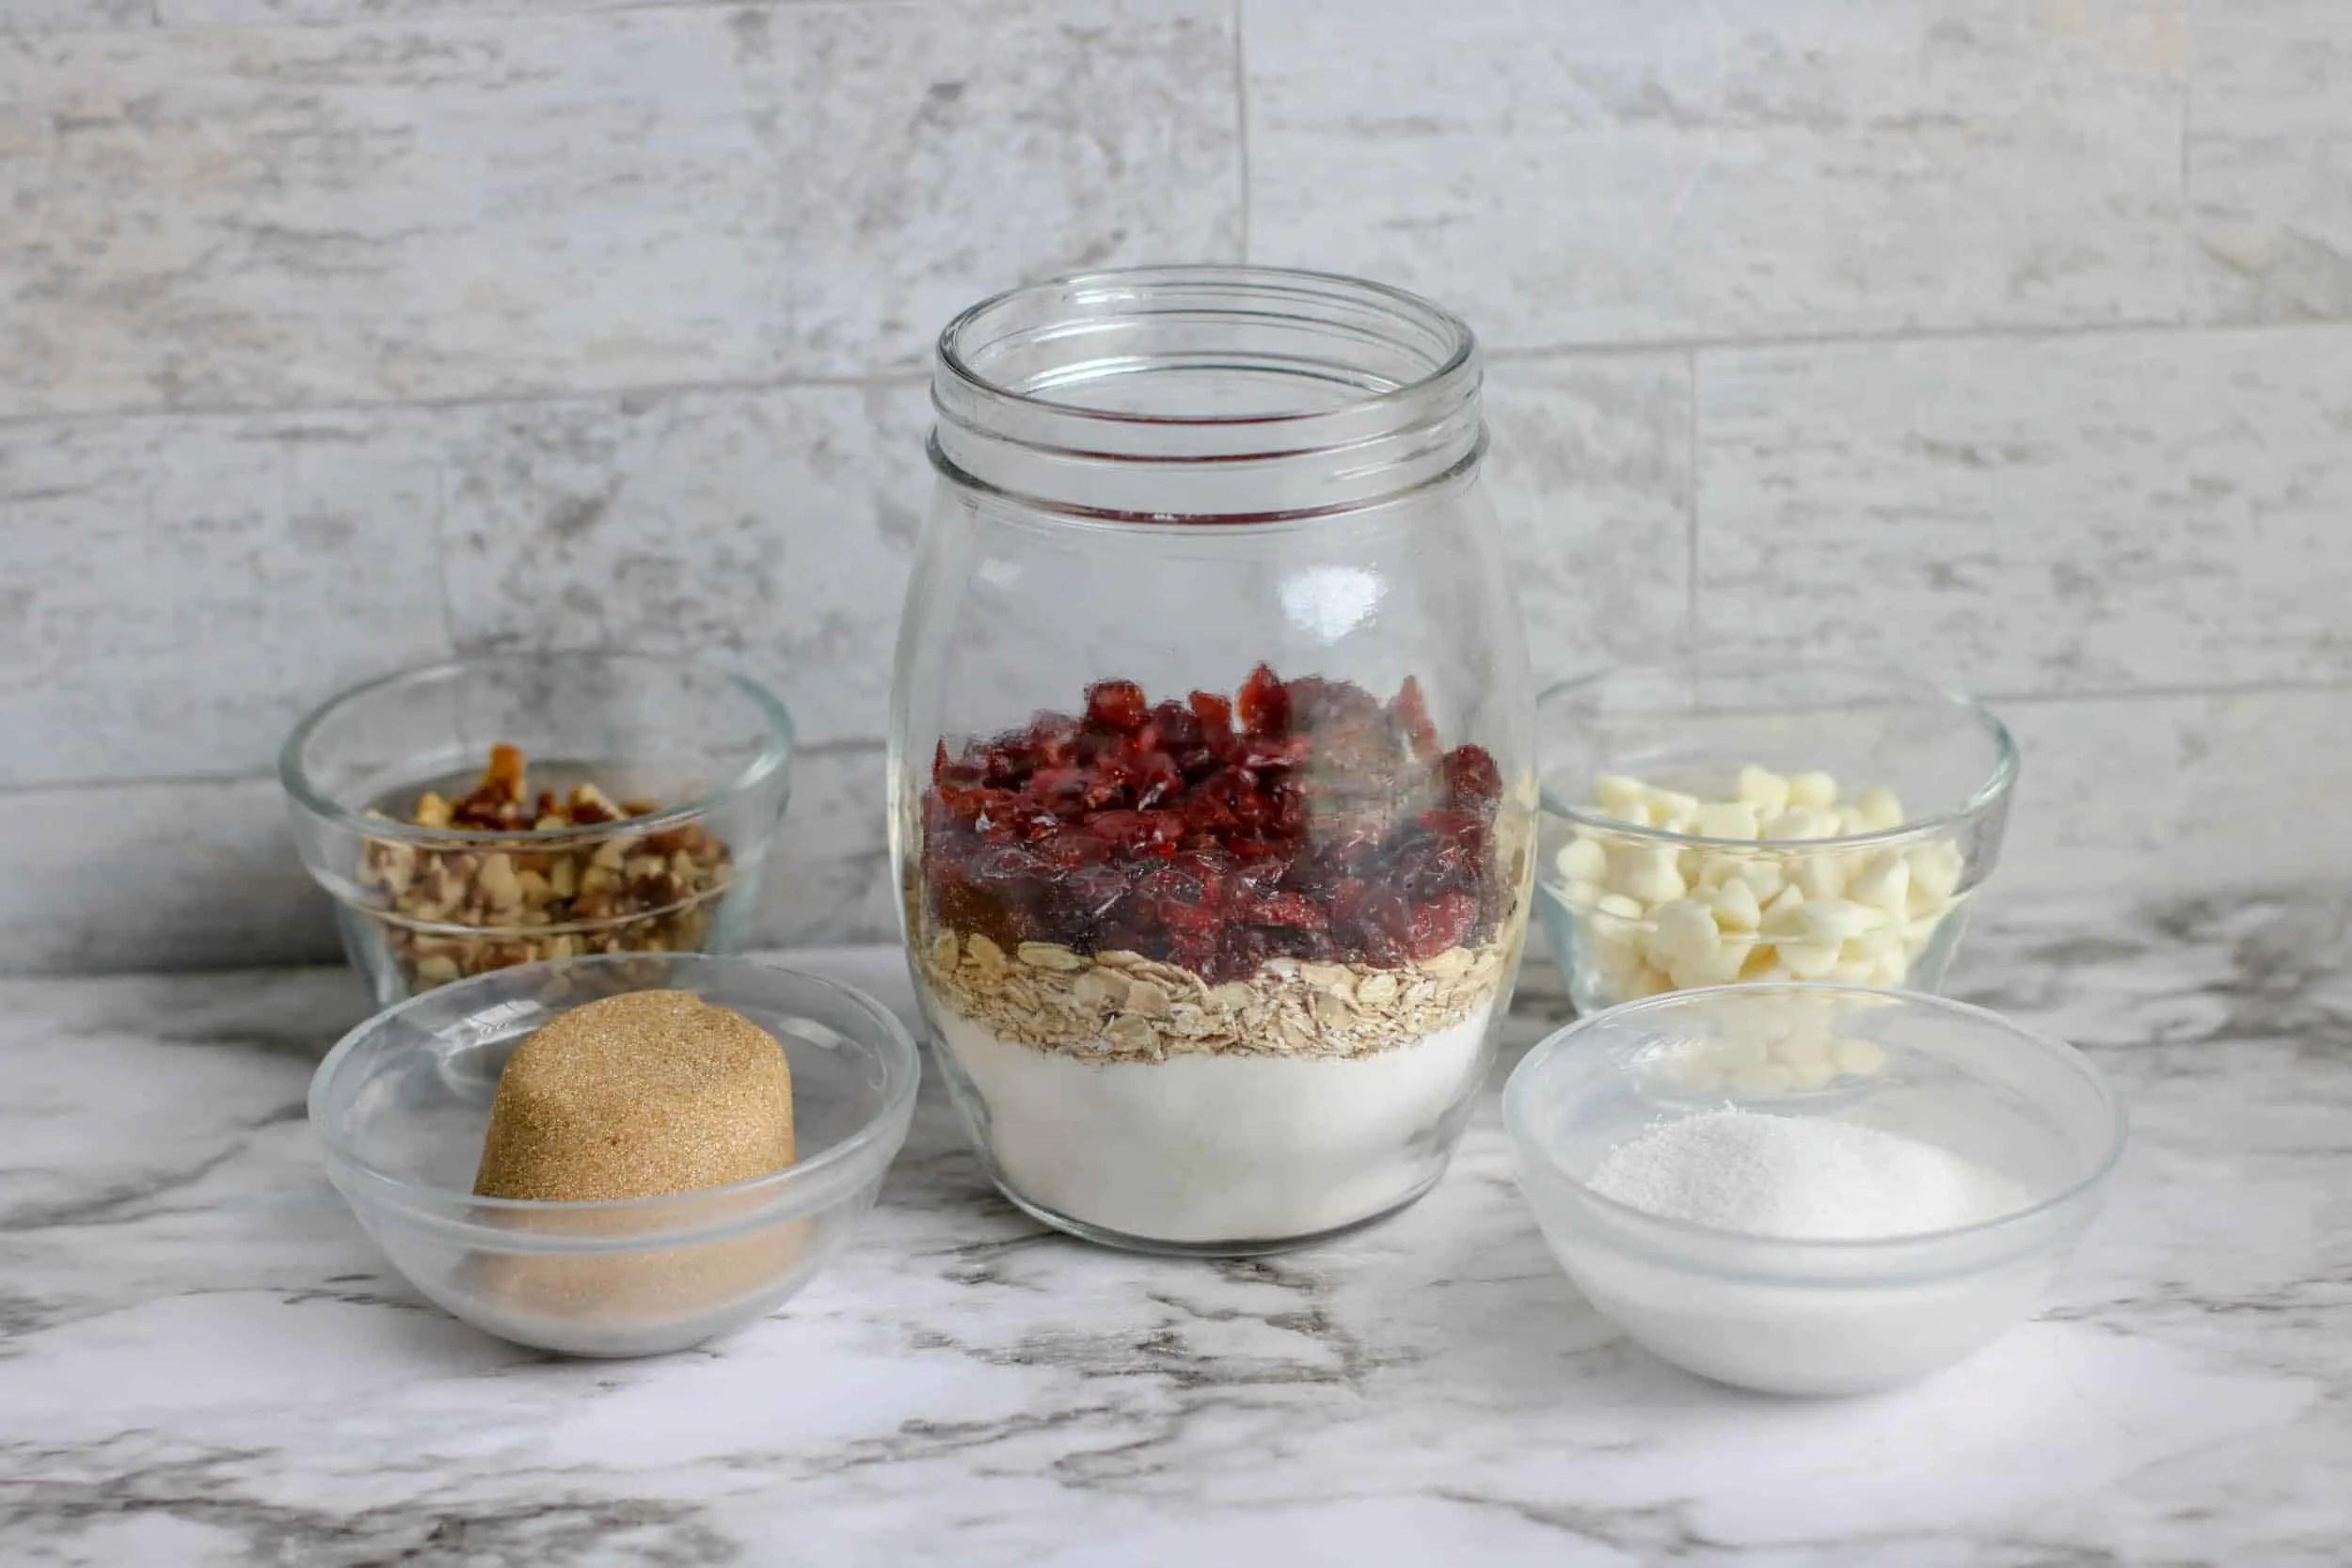 White Chocolate Cranberry Cookie Mix Jar Ingredients